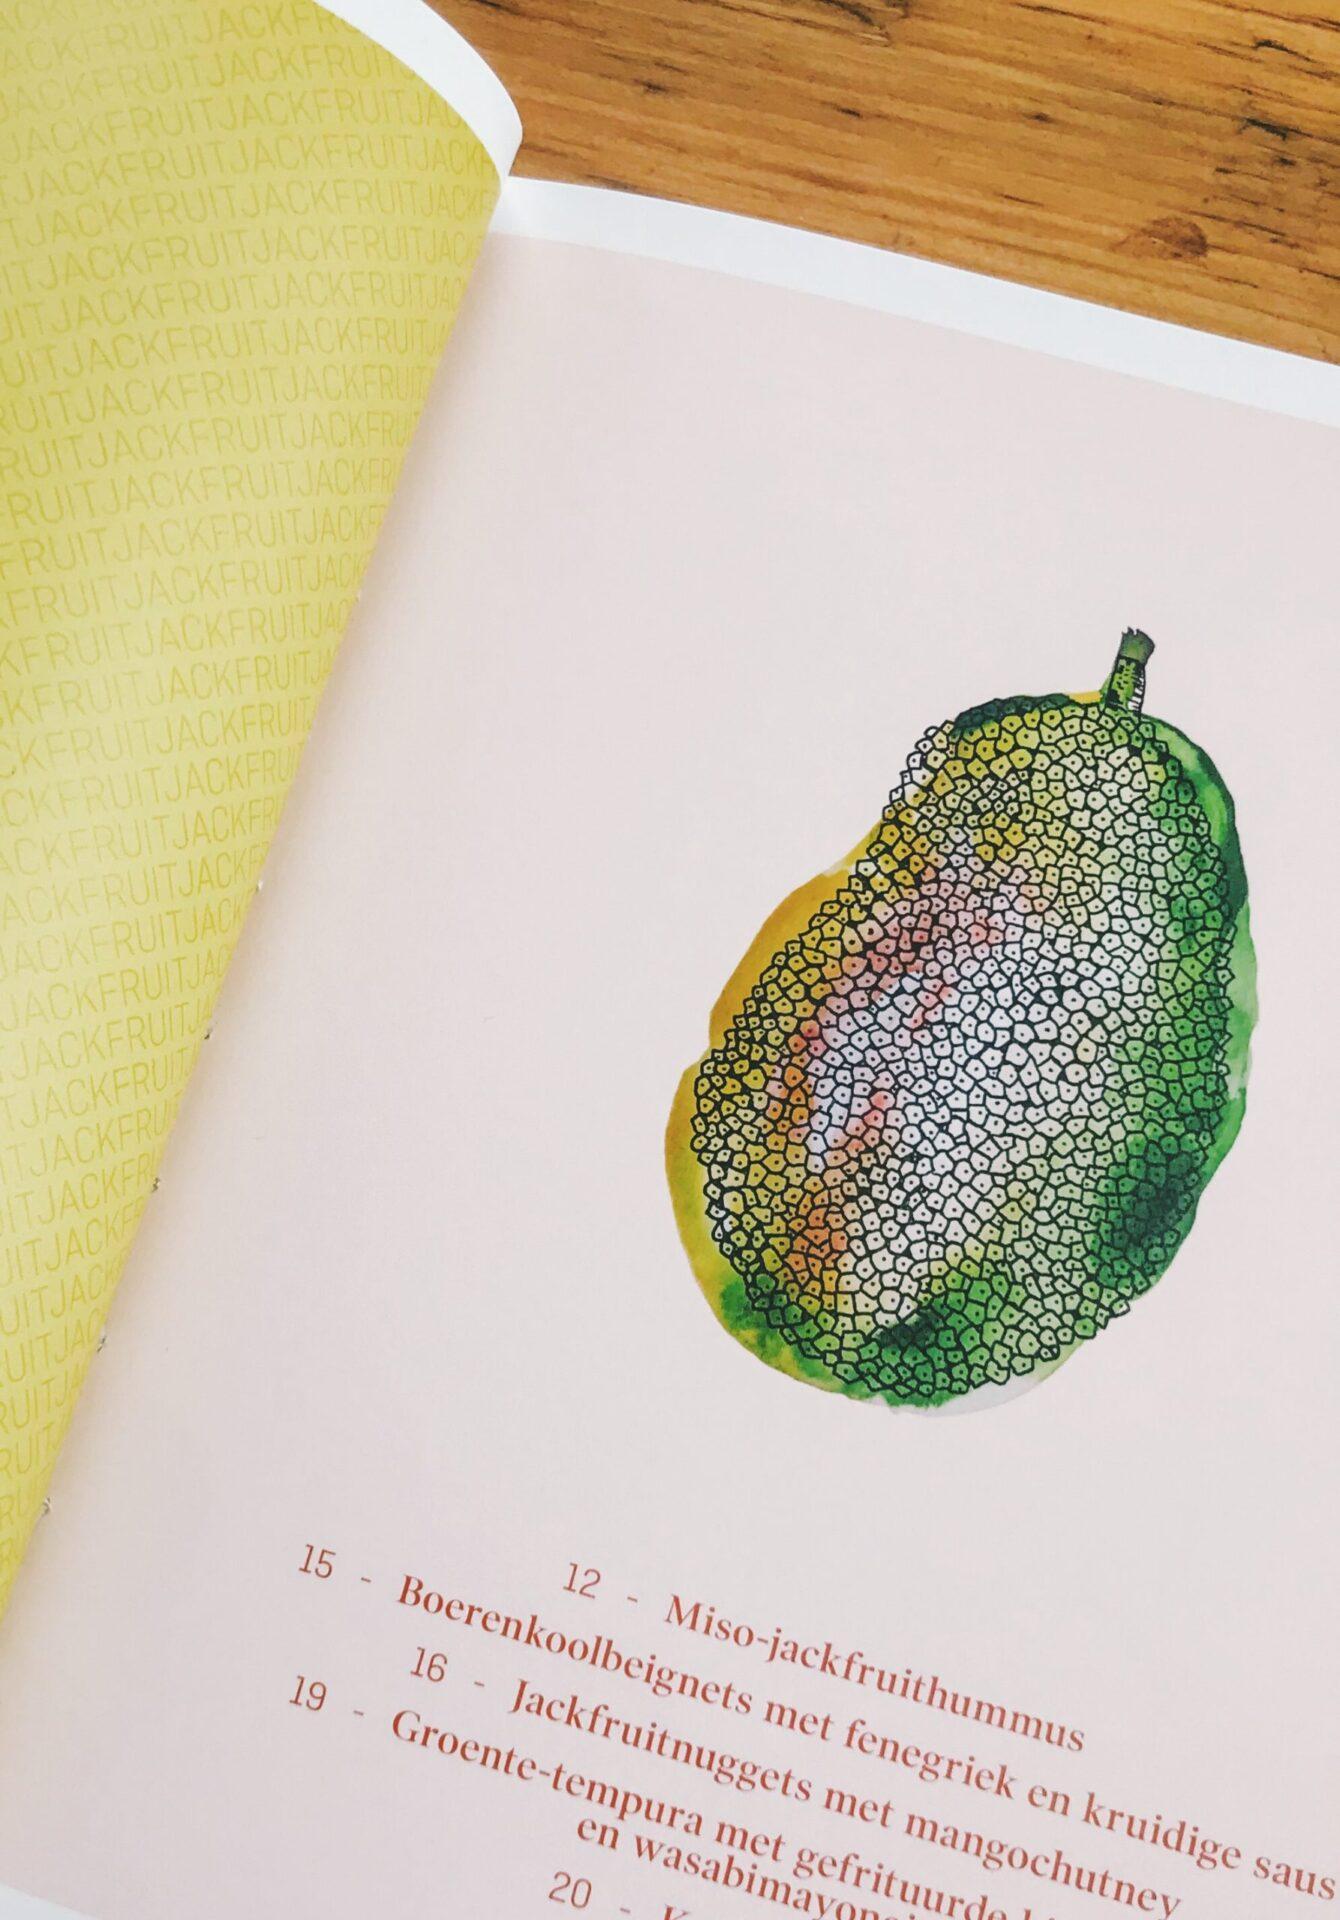 jackfruit-illustrations-cook-book-a-la-gonda-scaled